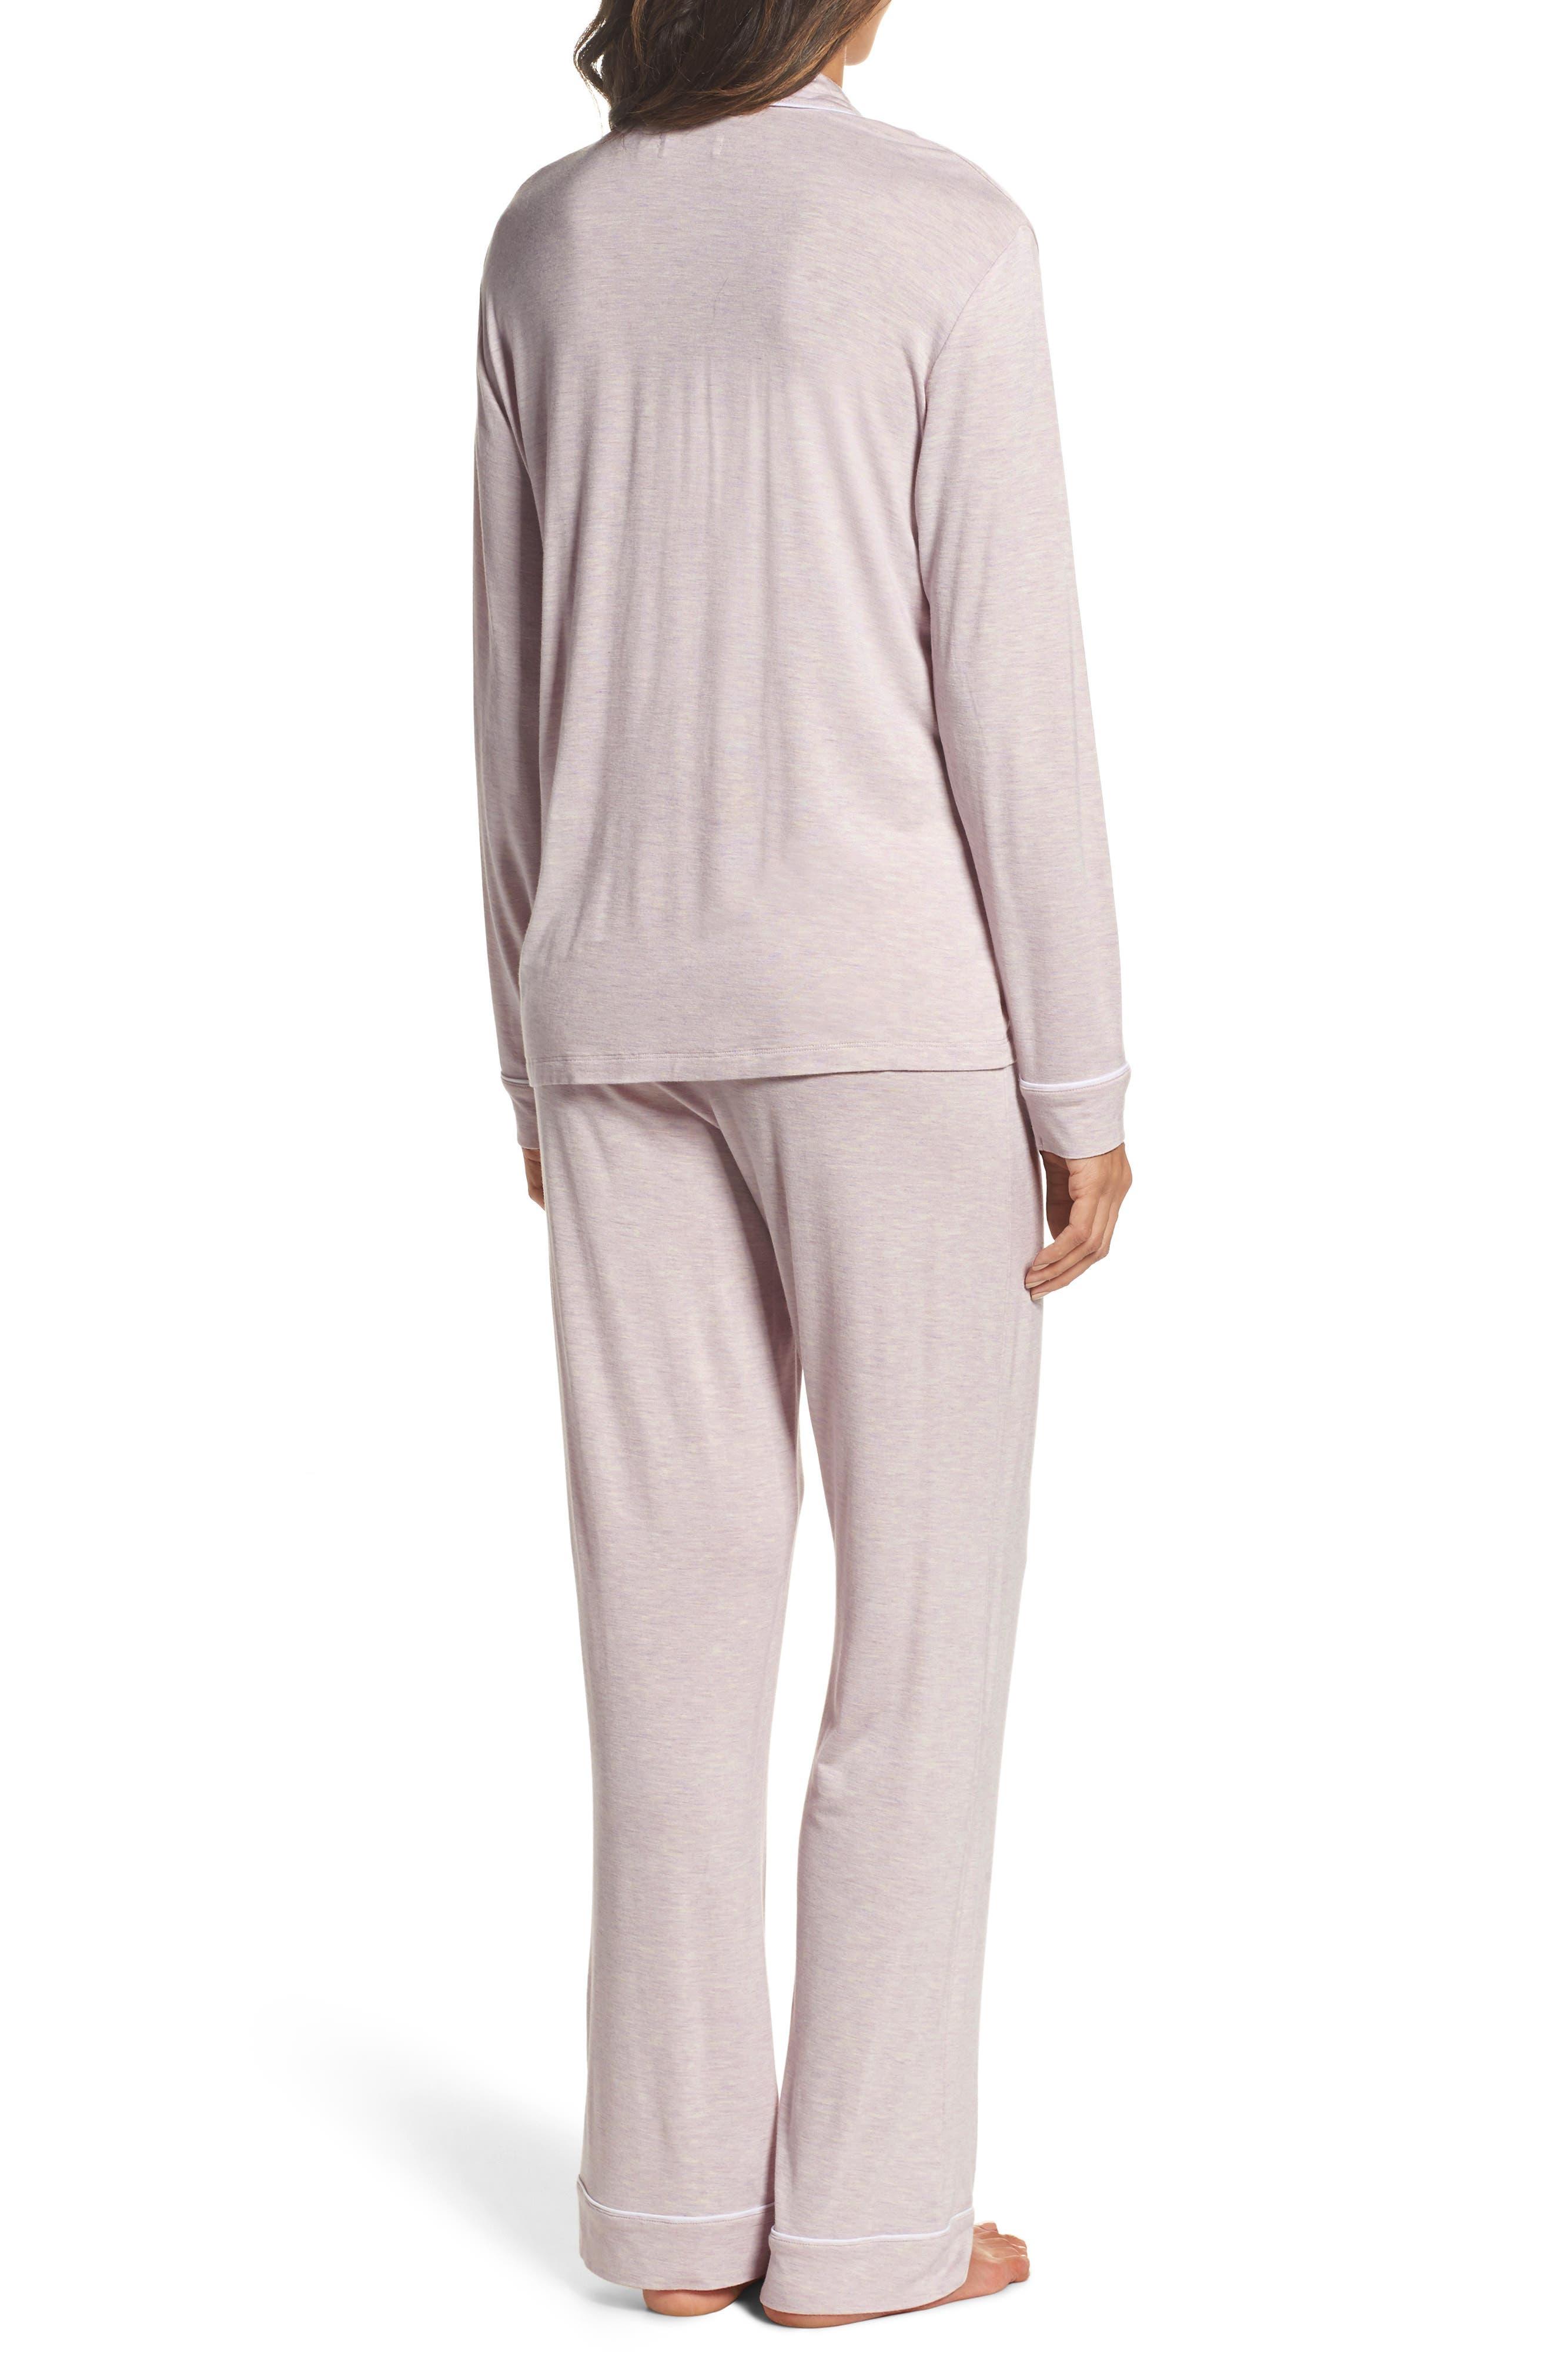 Lenon Jersey Pajamas,                             Alternate thumbnail 2, color,                             Lavender Fog Heather